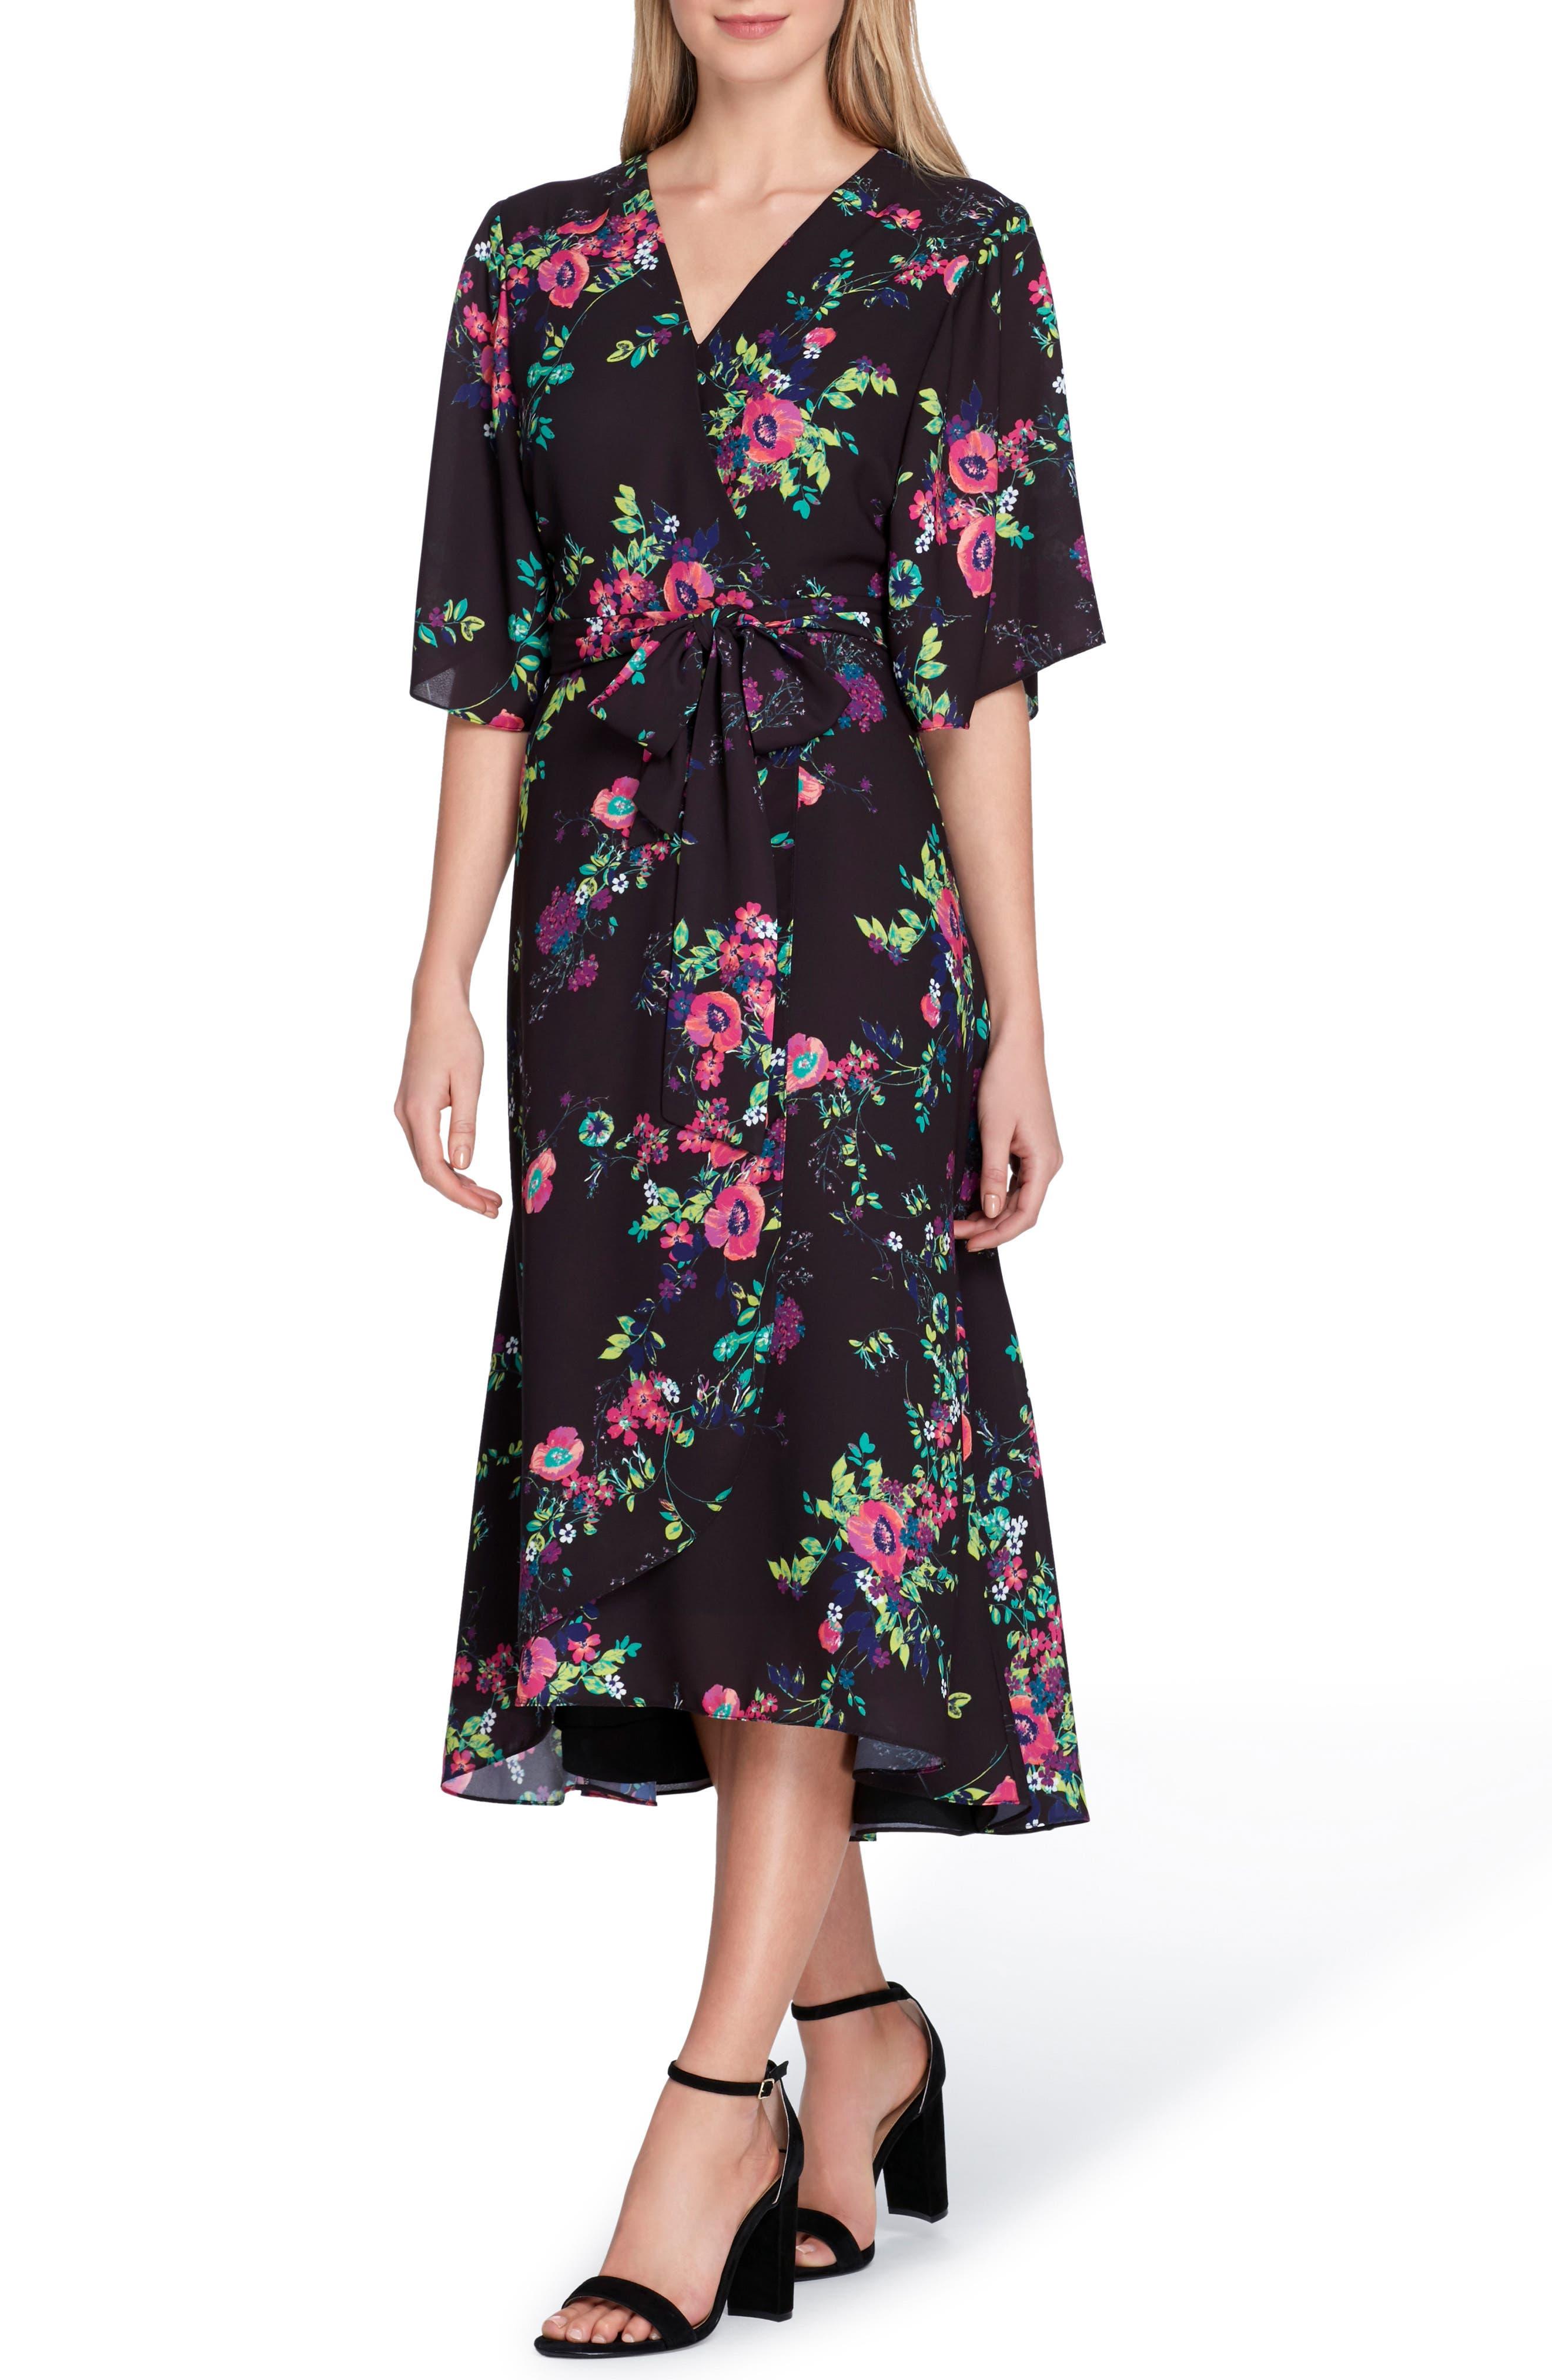 Floral Faux Wrap Midi Dress,                         Main,                         color, Black/ Fuchsia/ Green